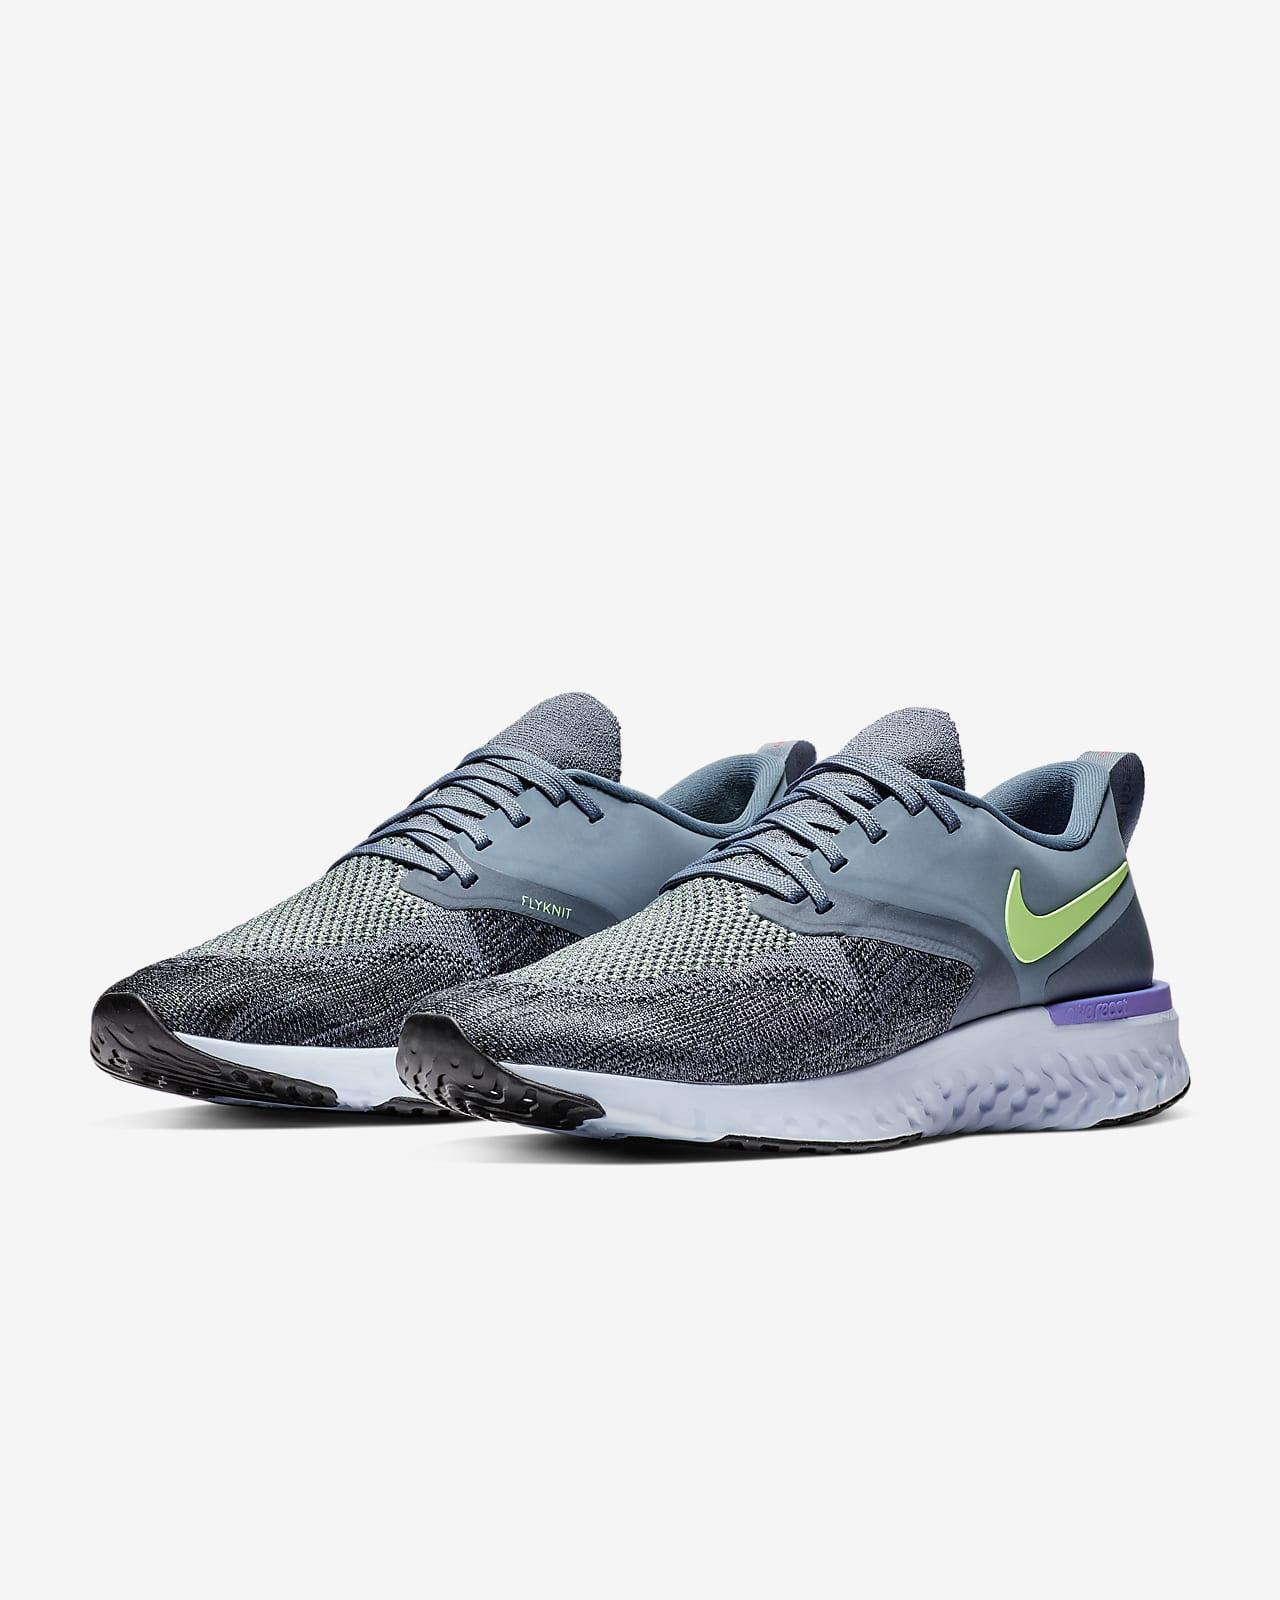 he equivocado Adolescente Escarpado  Nike Odyssey React Flyknit 2 Men's Running Shoe. Nike MY